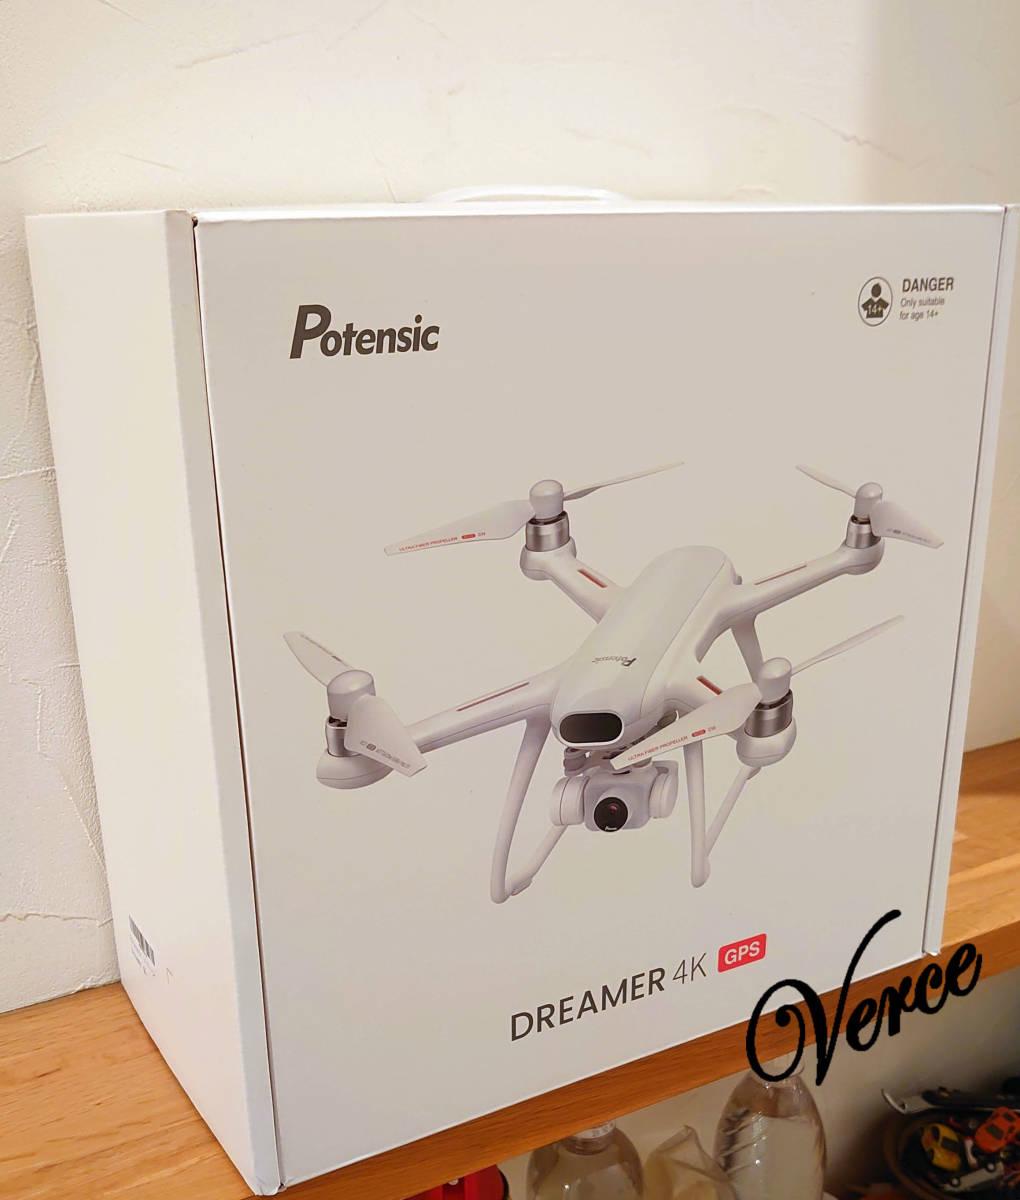 Potensic ドローン Dreamer P1 4K HDカメラ SONYセンサー GPS 31分間飛行 2時間充電 モード1 モード2 転換可能 リターンモード 白 ホワイト